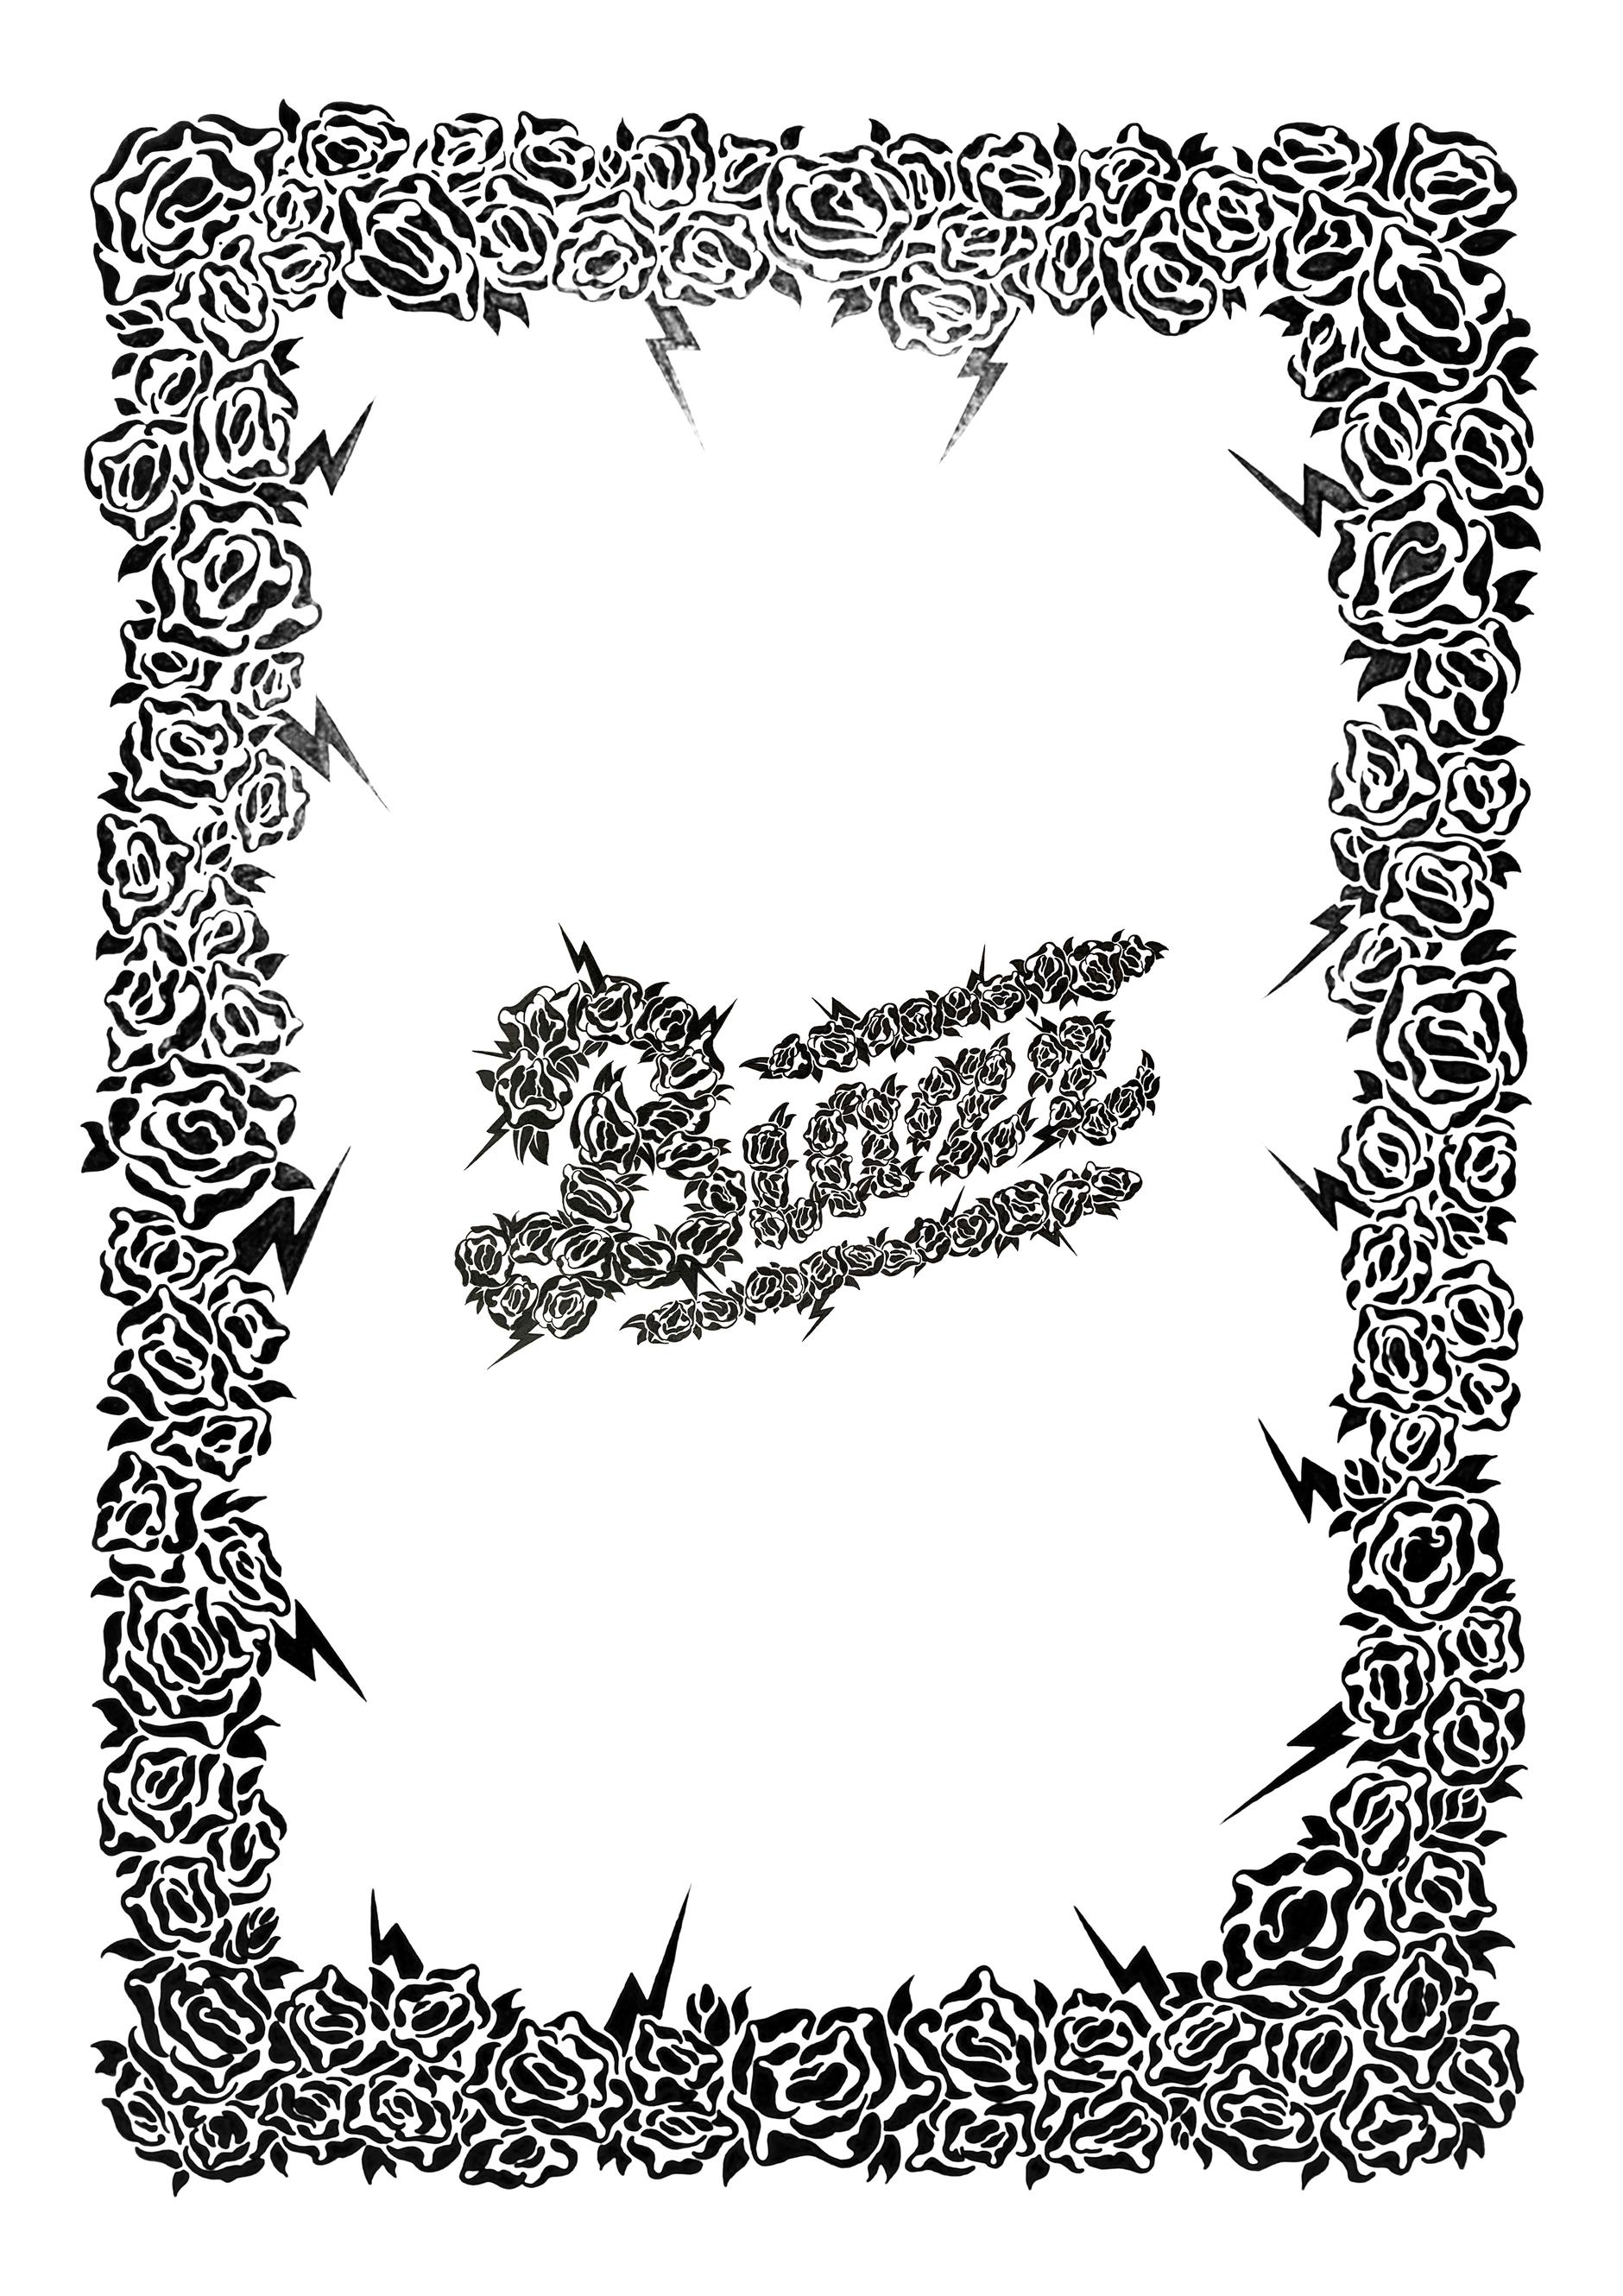 OFFICE BLAZZ